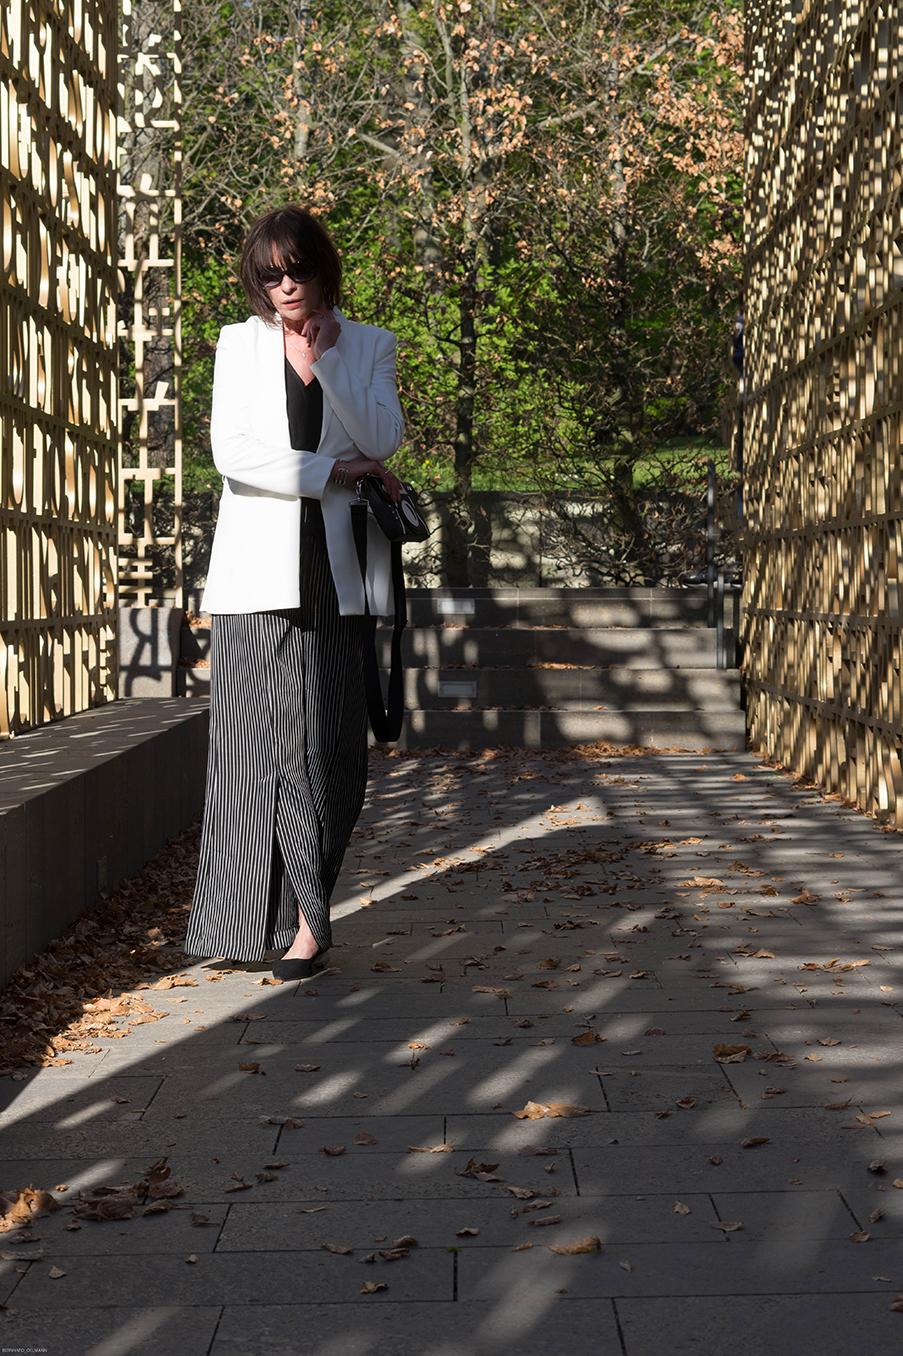 Just-take-a-look Berlin - Gärten der Welt Outfit 2-2.1